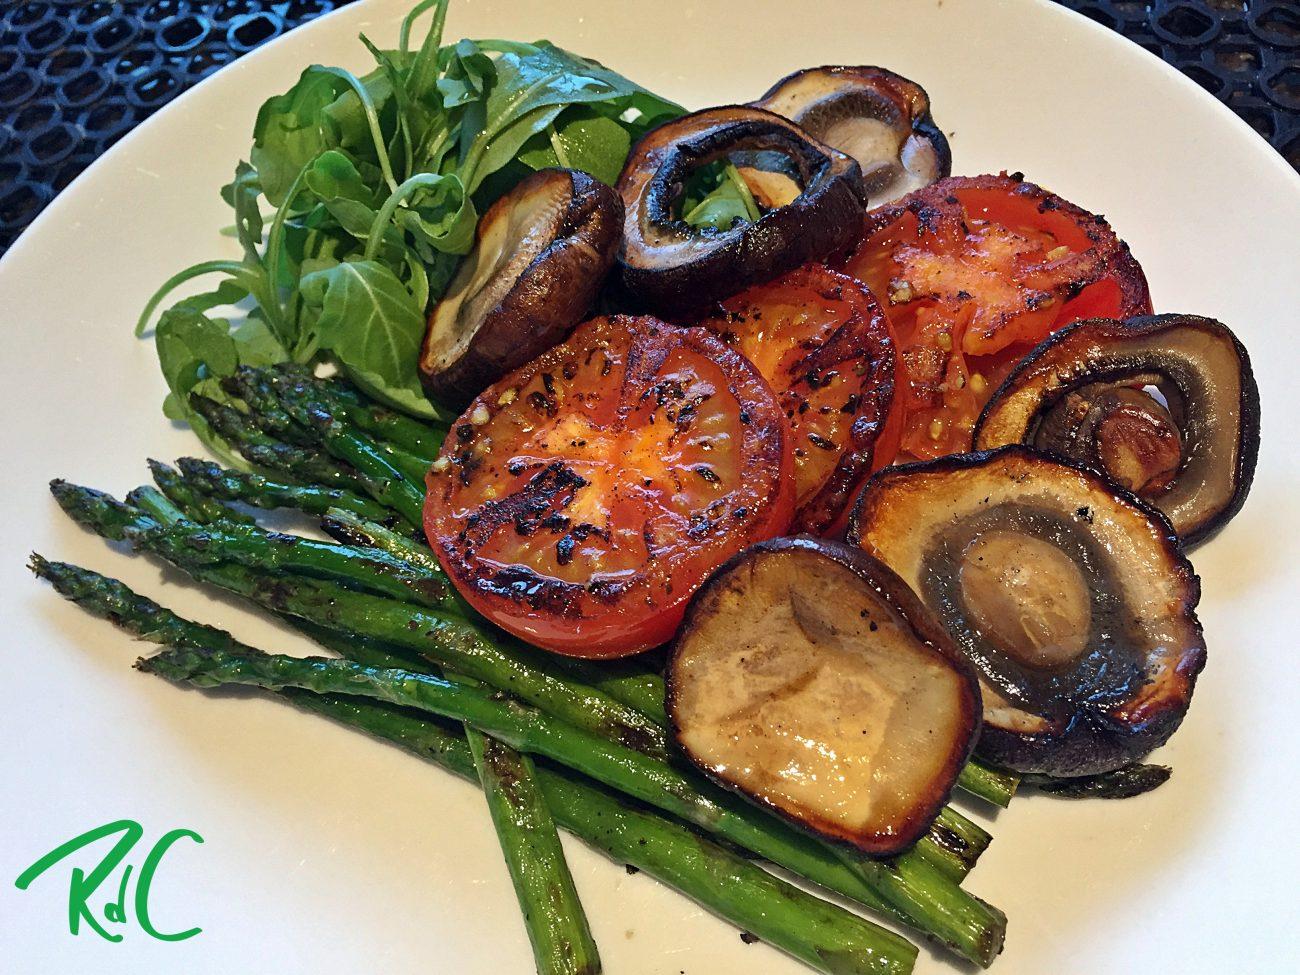 Asparagus, Mushroom & Tomato Pan Brekky